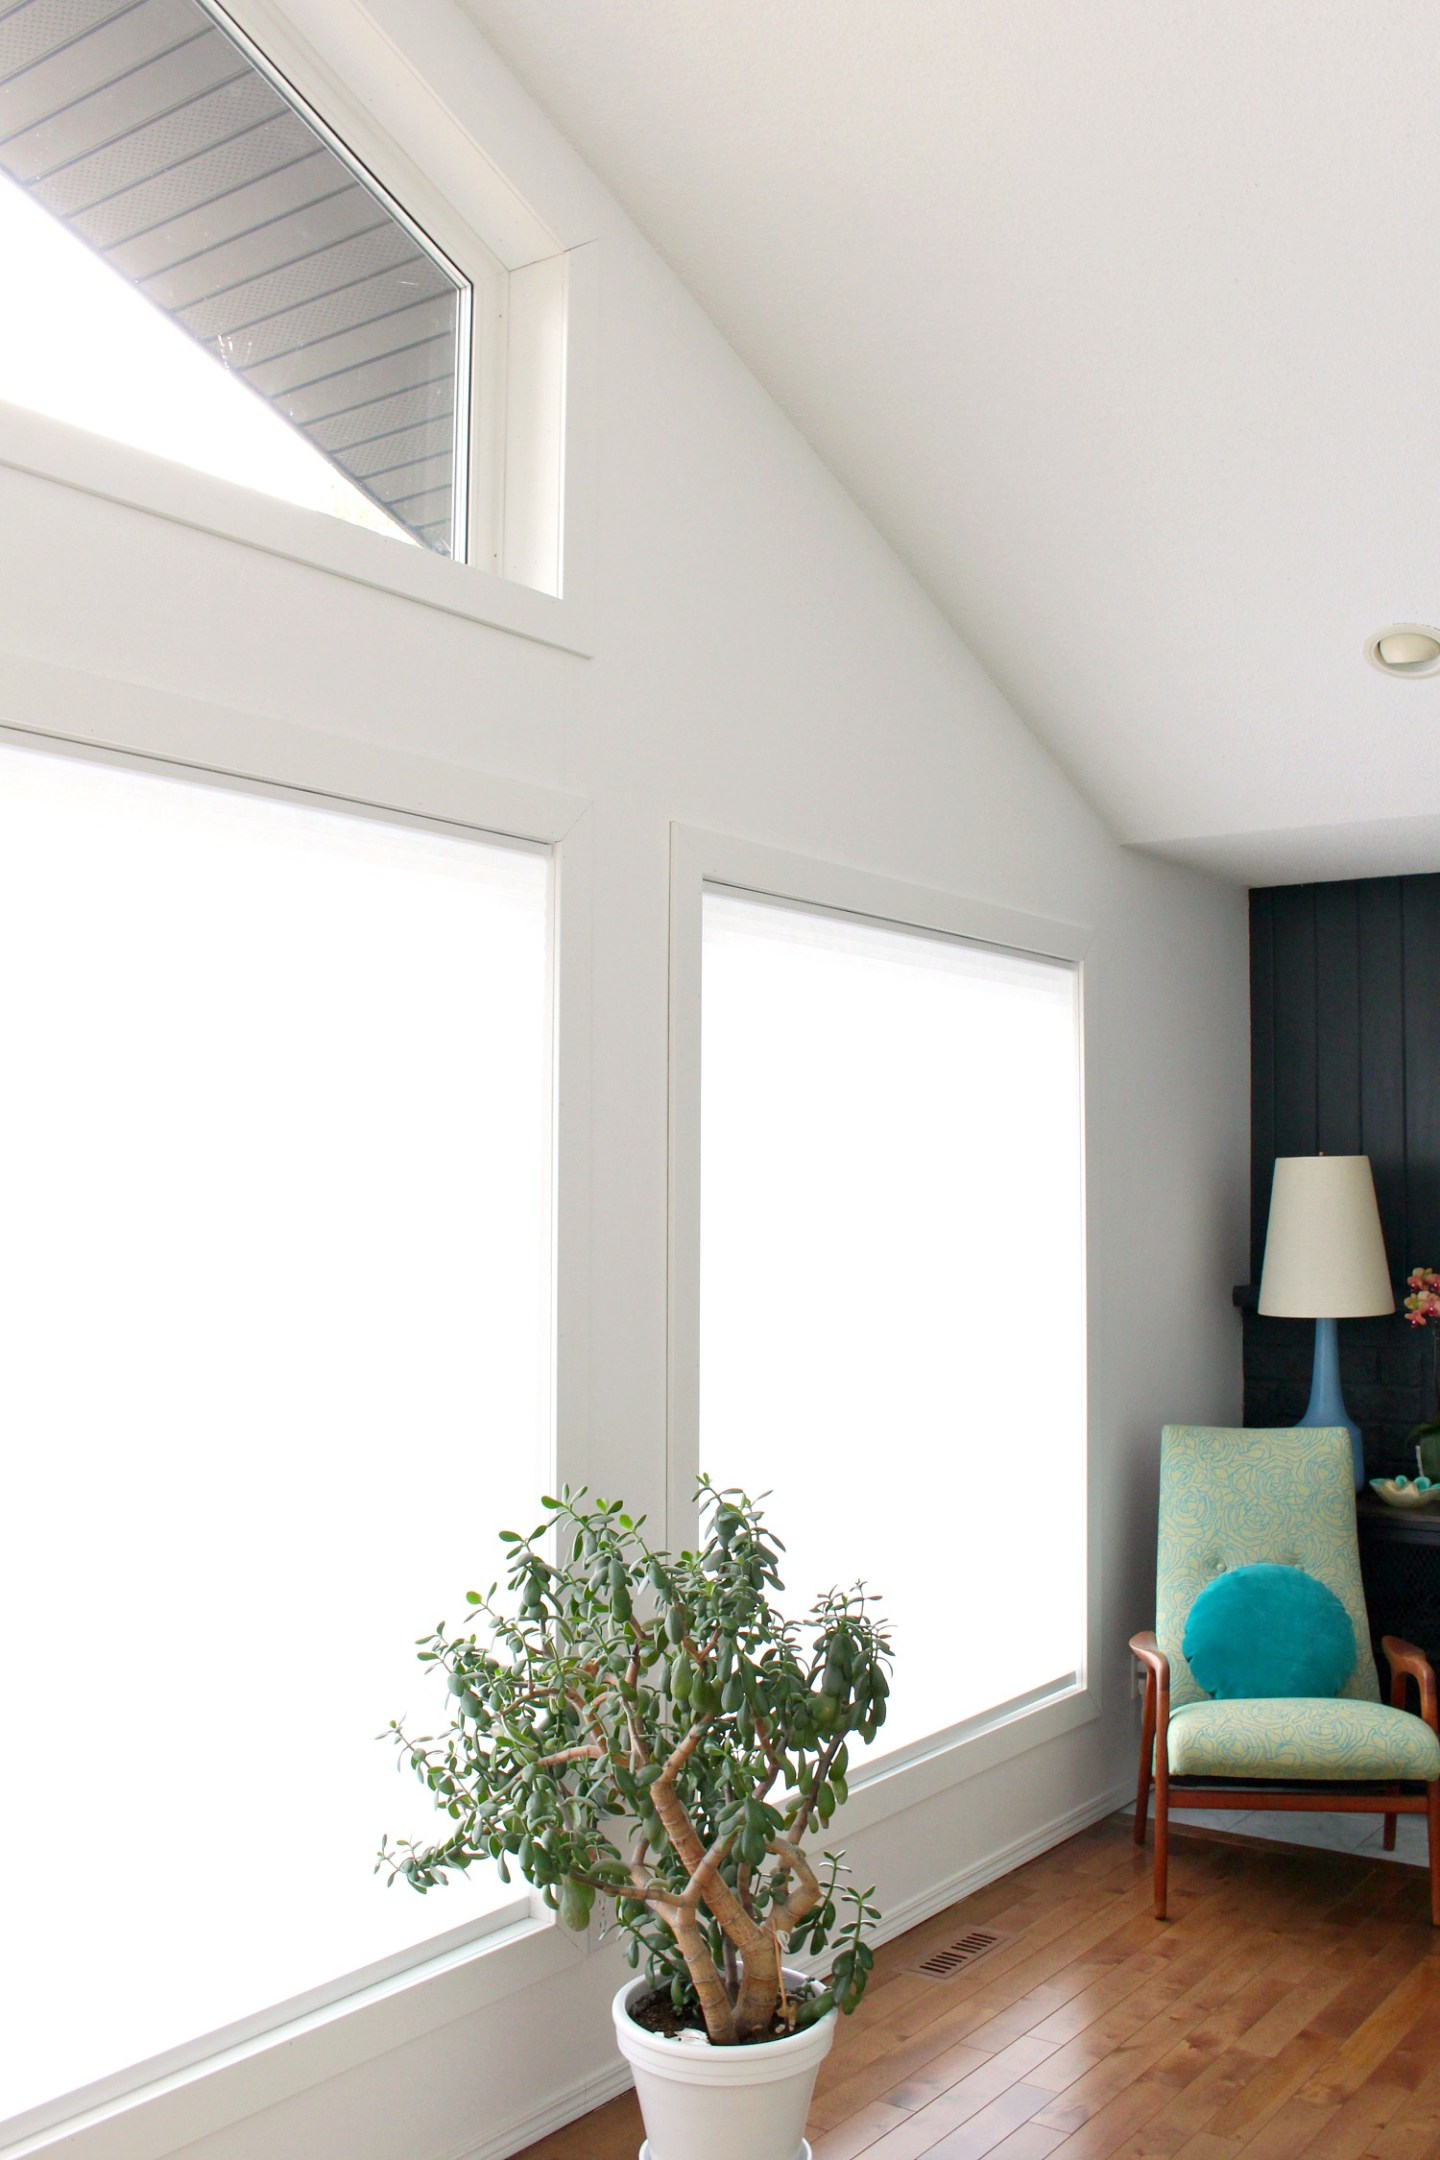 Our Custom Window Shades vs Cheap Window Shades | Review + Shopping Process. PureVu Honeycomb Shades Slate